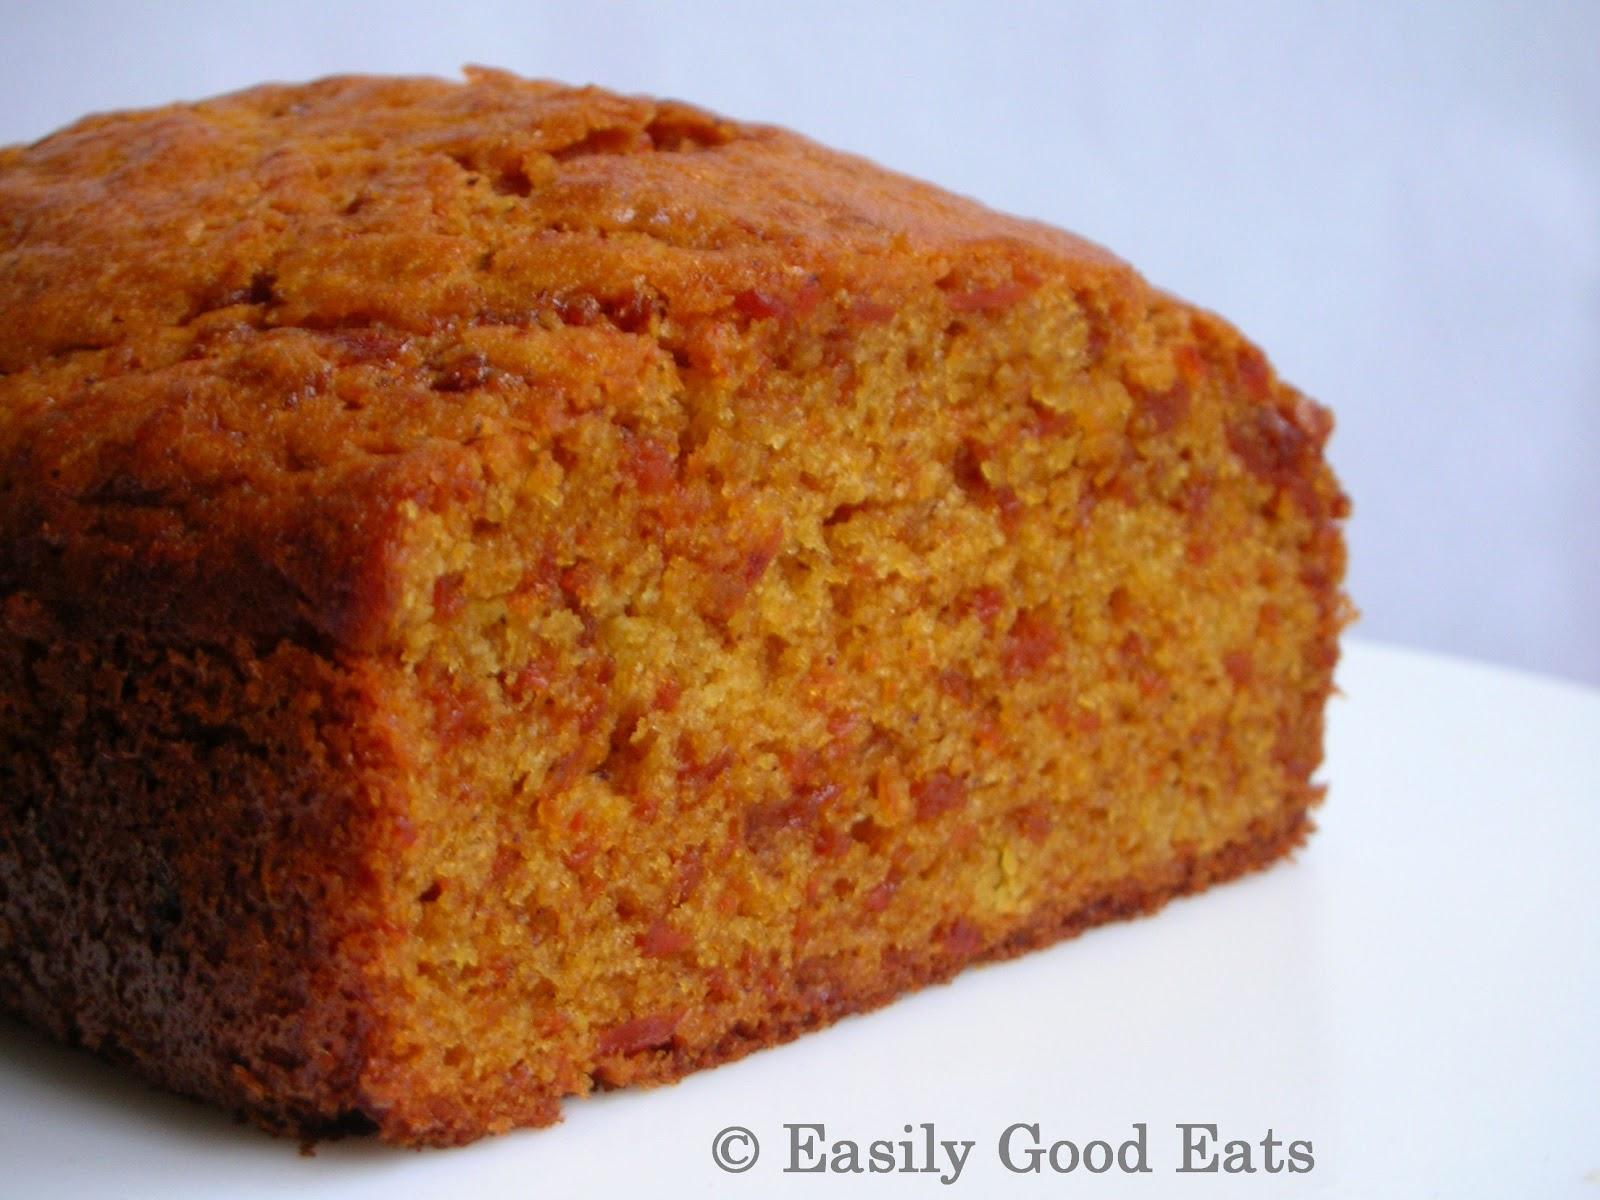 Easily Good Eats Butterscotch Caramelised Carrot Cake